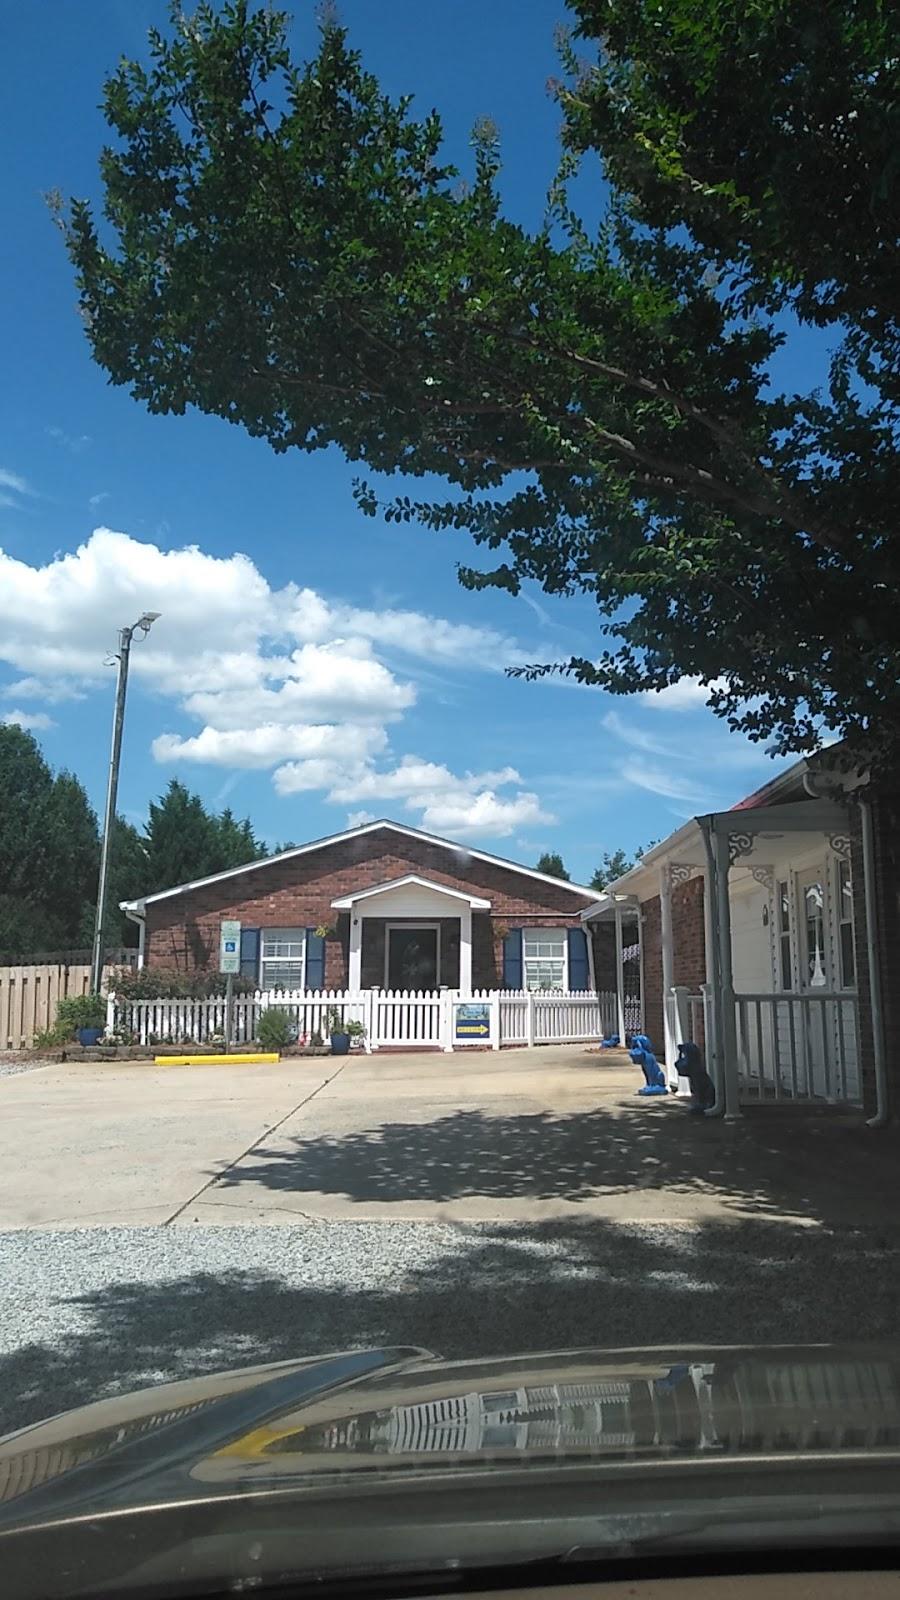 Loving Pet Inn & Resort -     Photo 5 of 10   Address: 820 Gallimore Dairy Rd, High Point, NC 27265, USA   Phone: (336) 393-0670